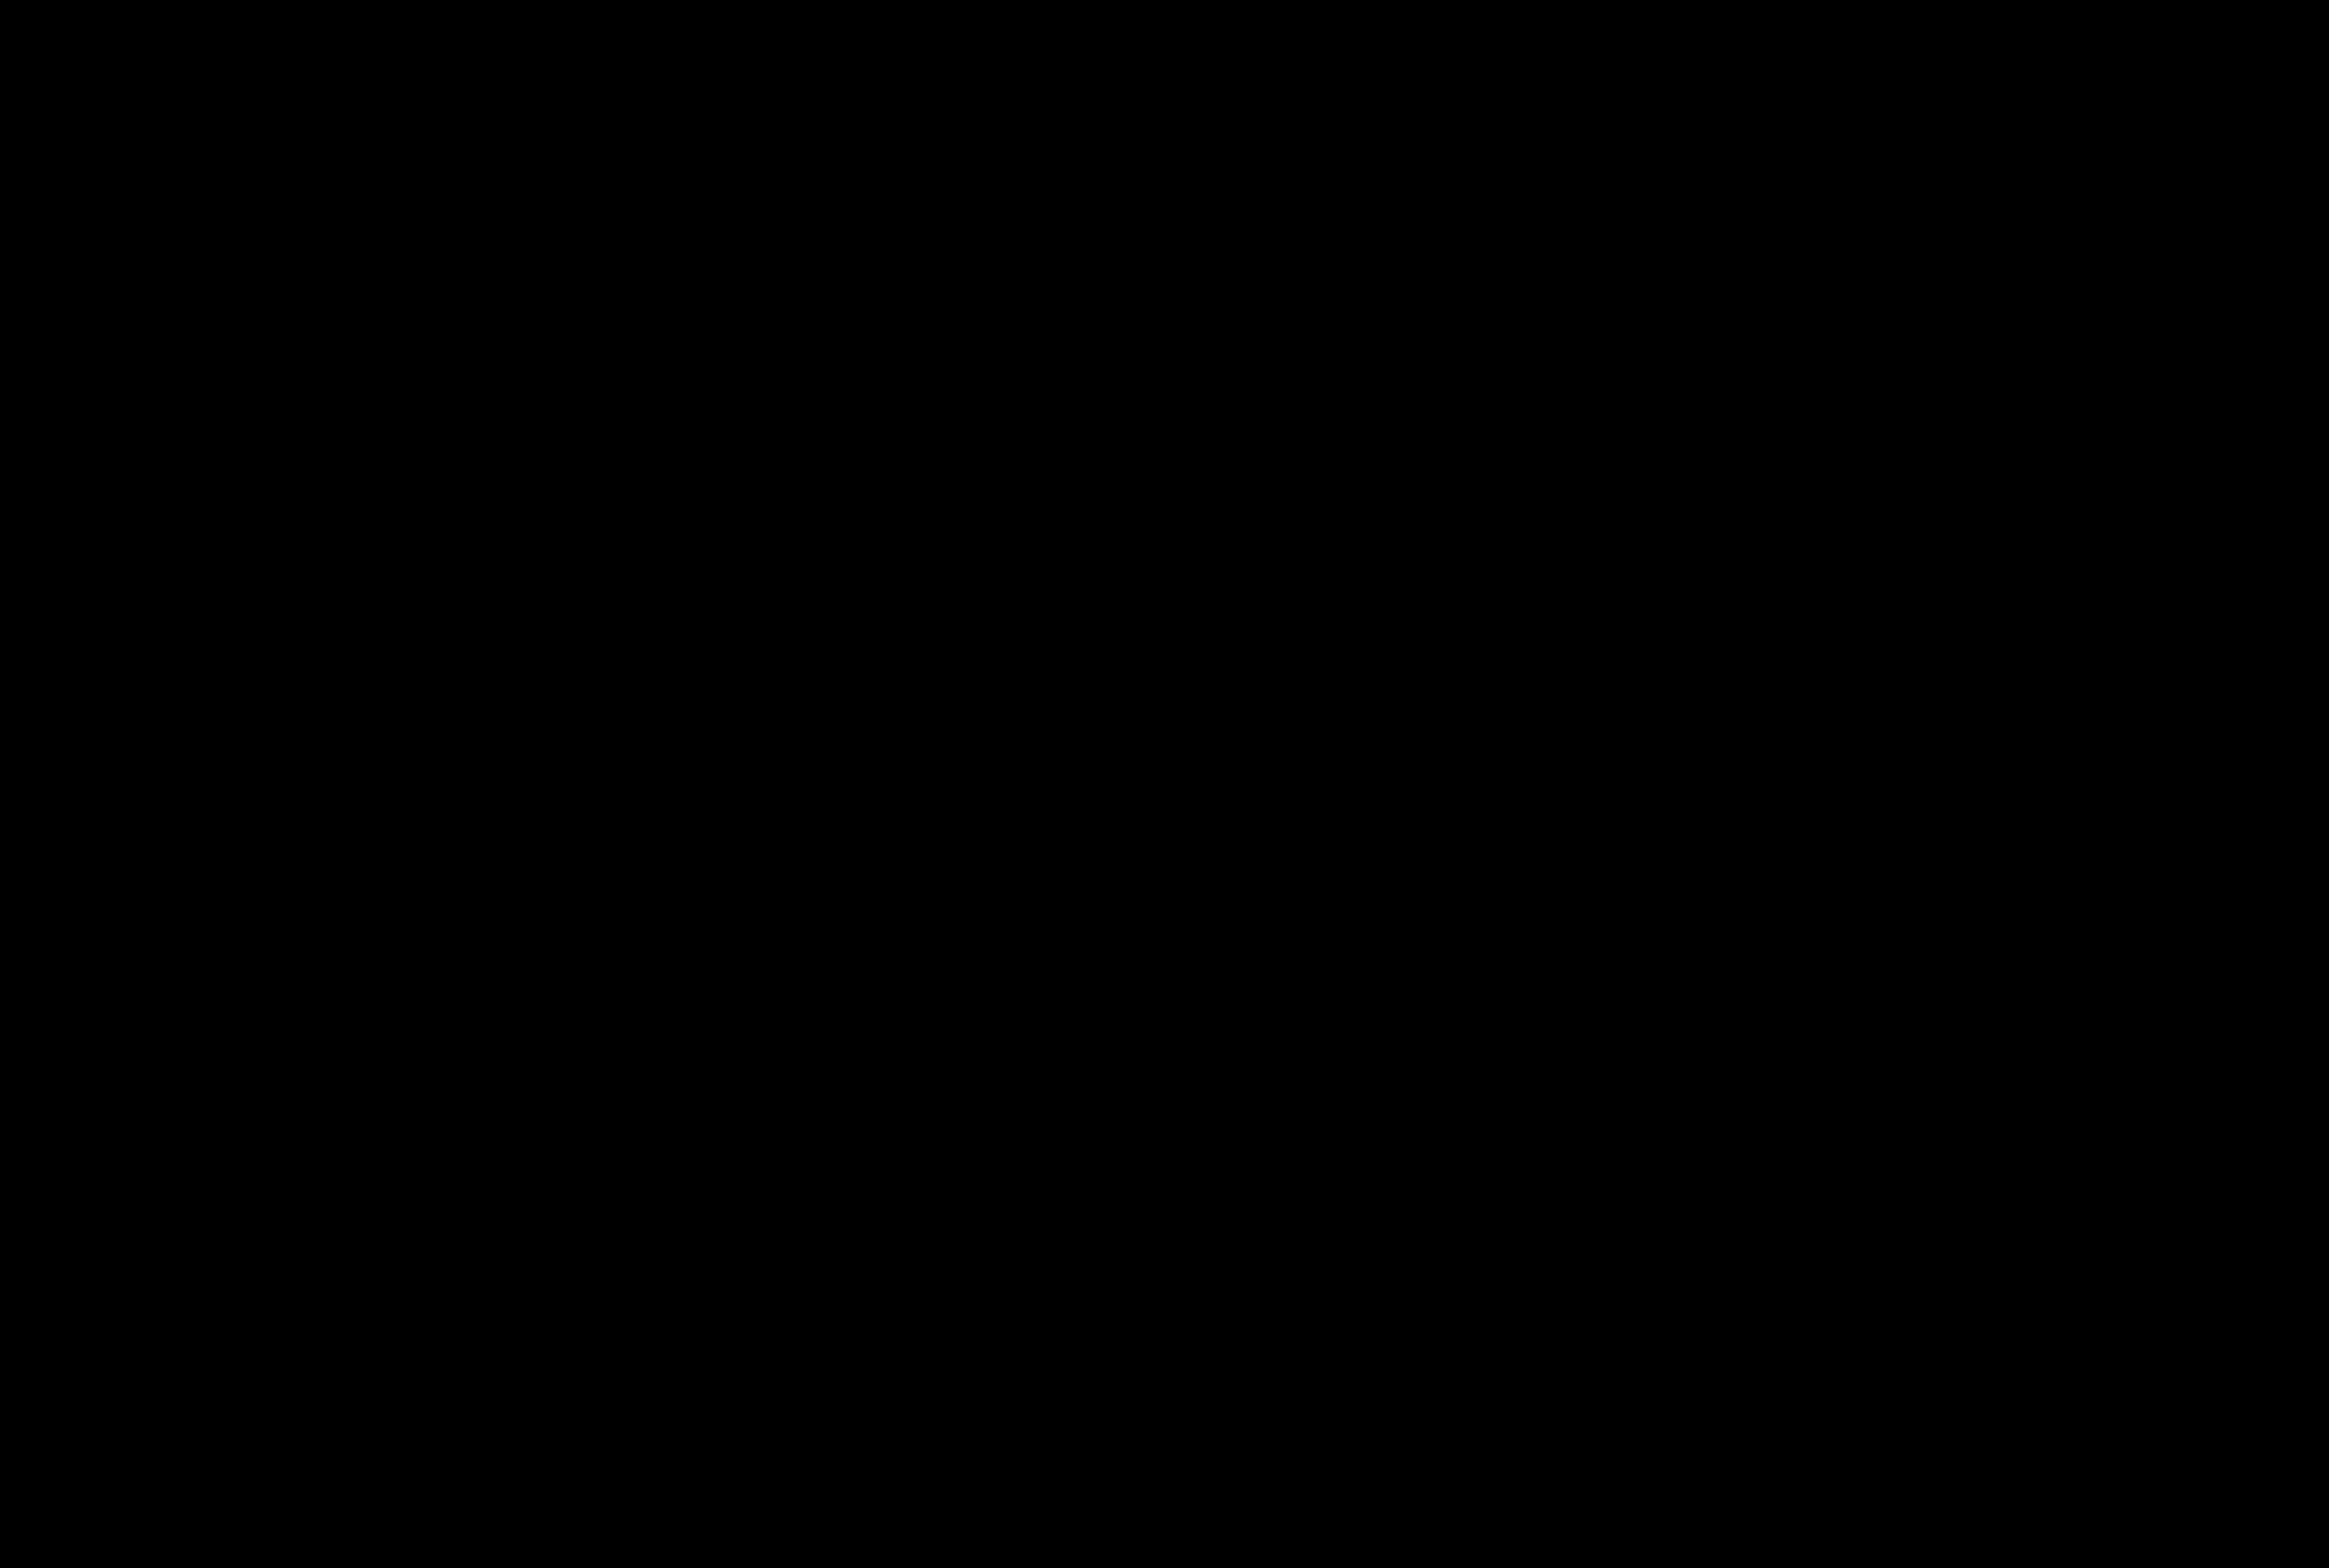 GIFF17 Selection Laurel Transparent - Black.png